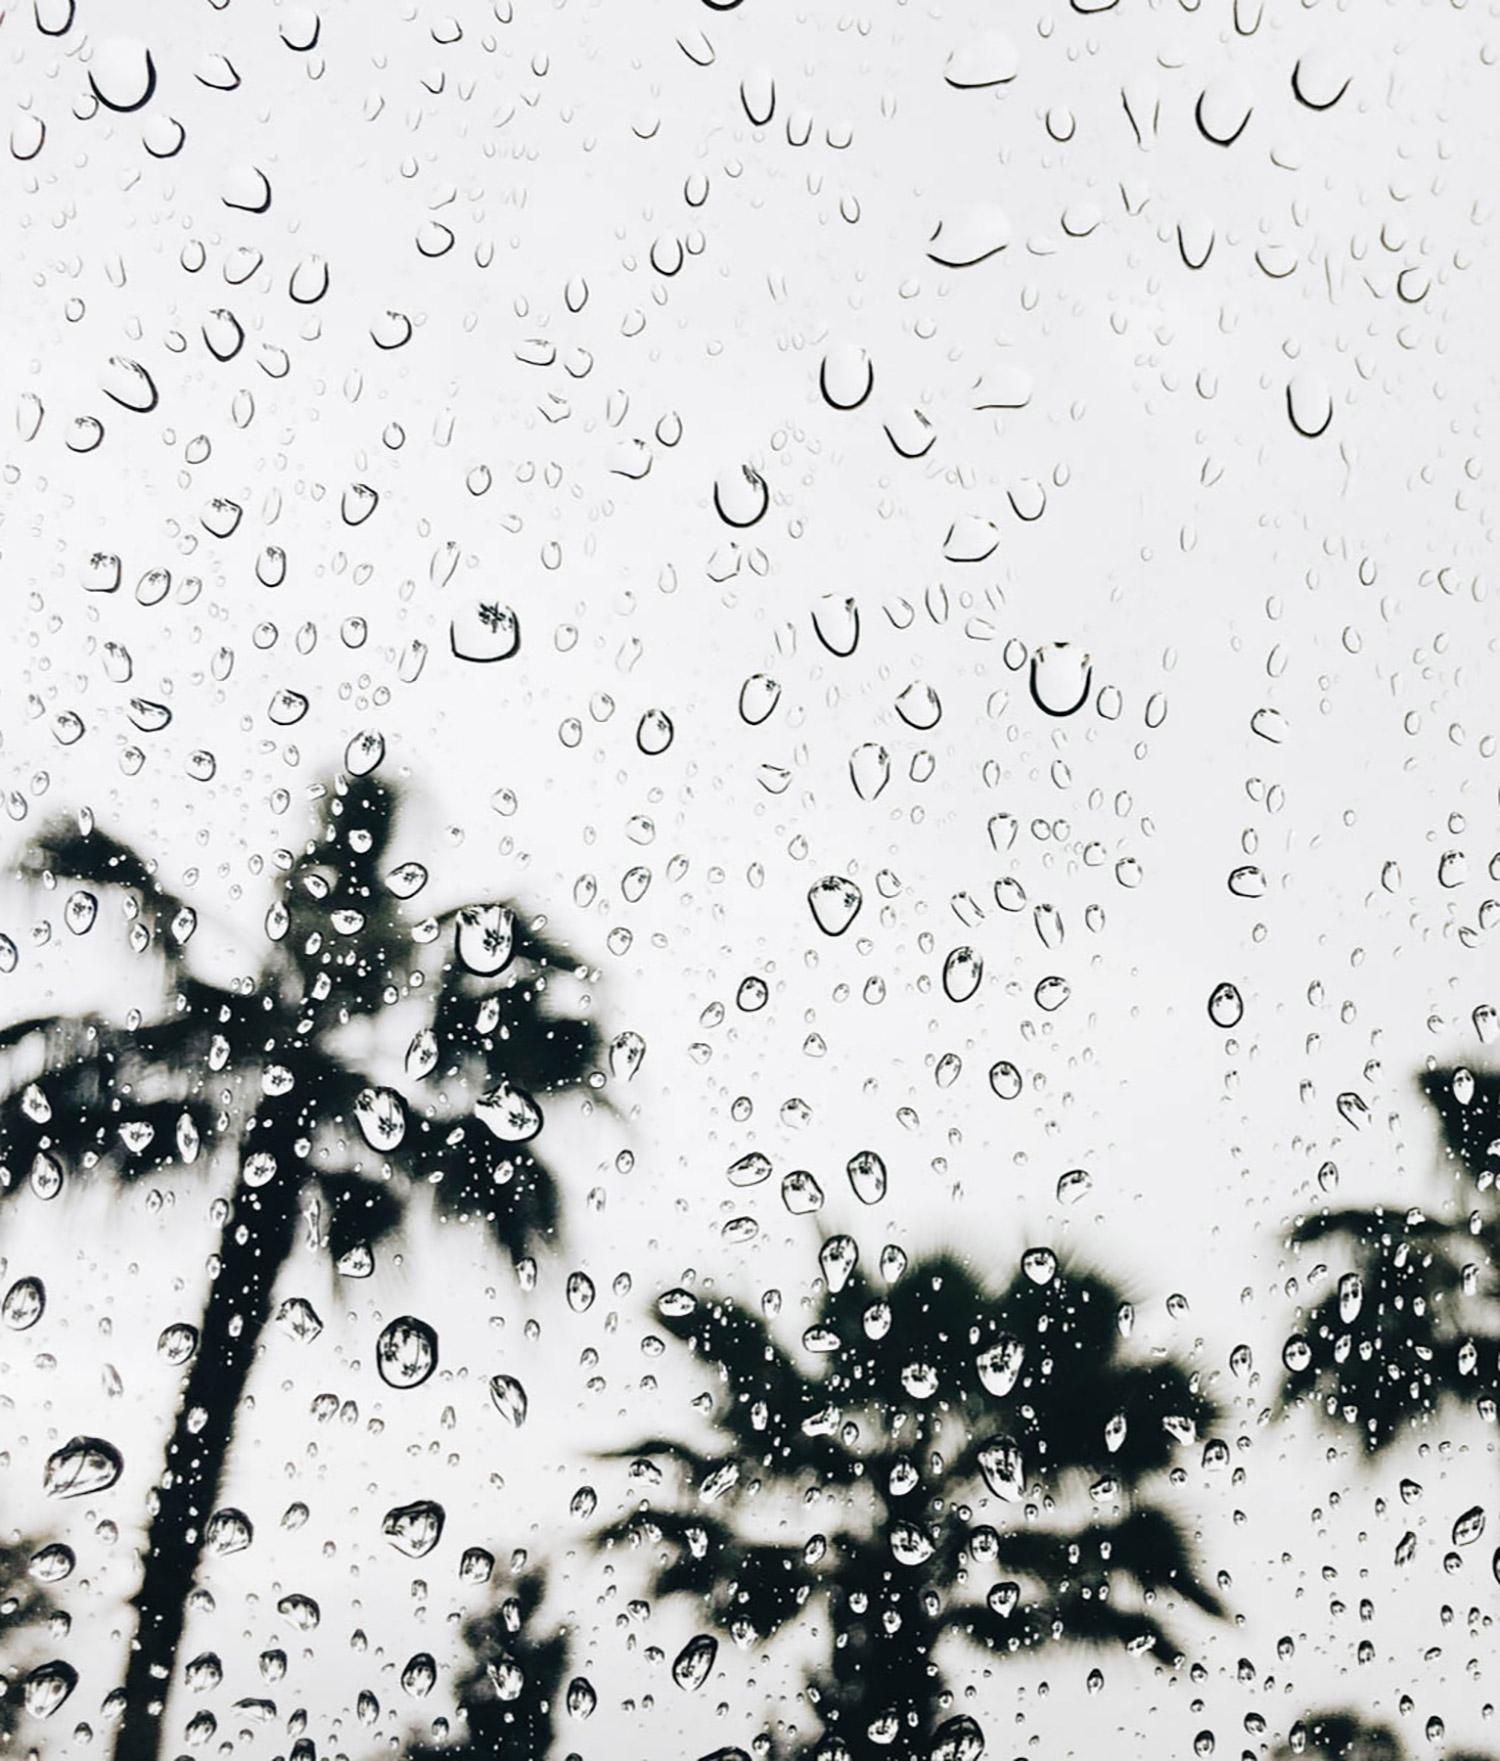 5-palm-trees-through-rainy-window.jpg